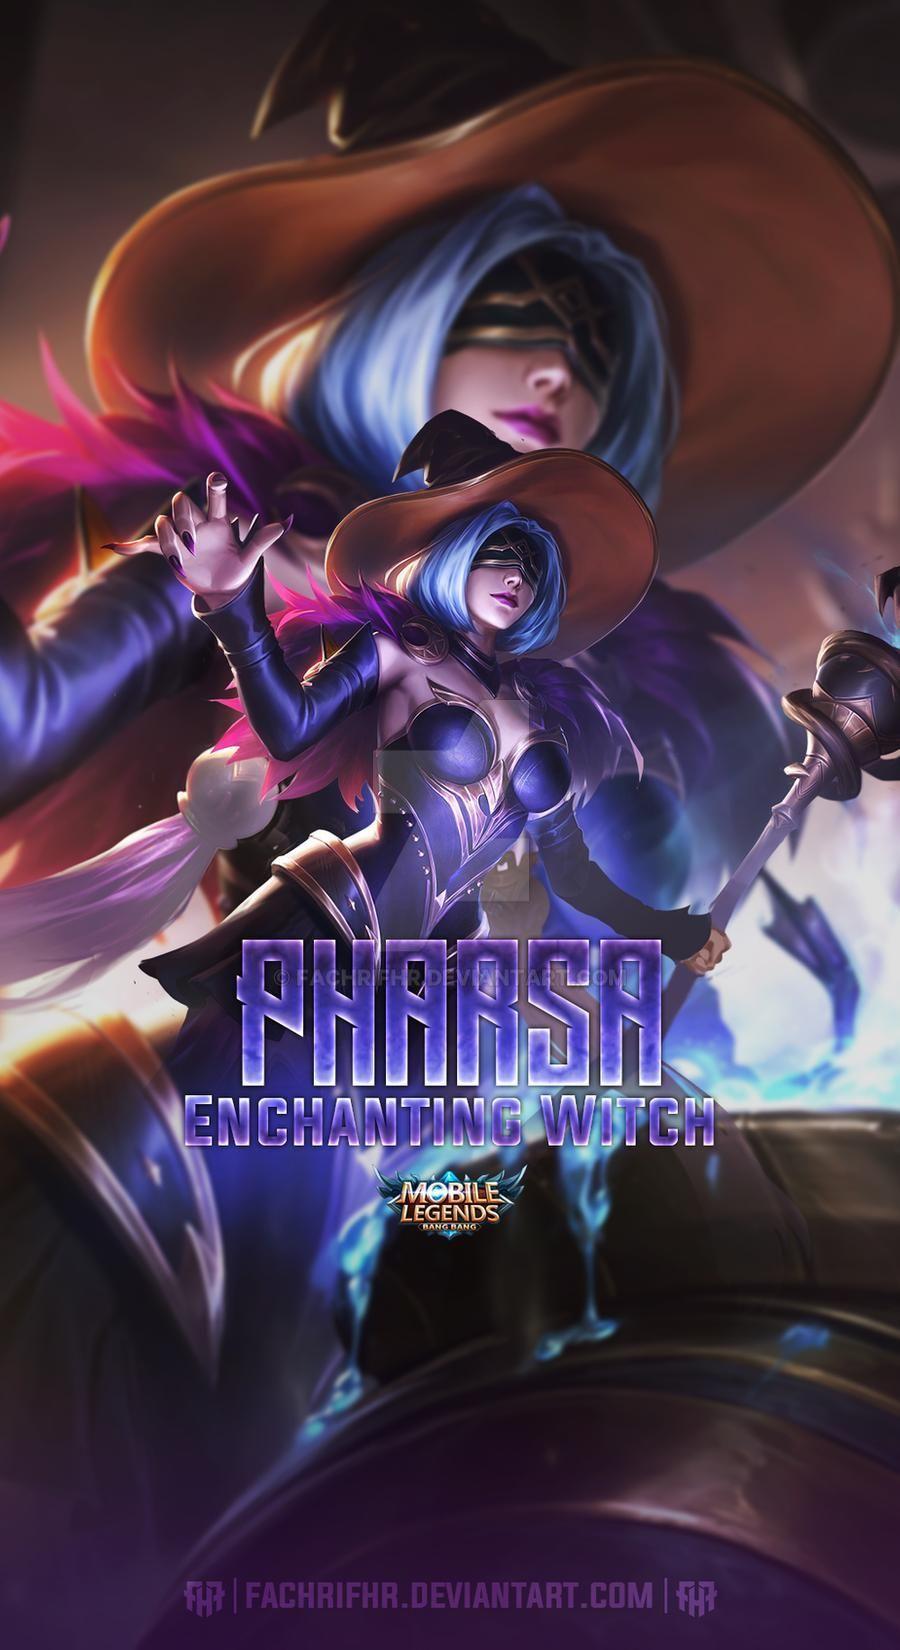 Pharsa Enchanting Witch By Fachrifhr On Deviantart In 2020 Mobile Legend Wallpaper Mobile Legends The Legend Of Heroes